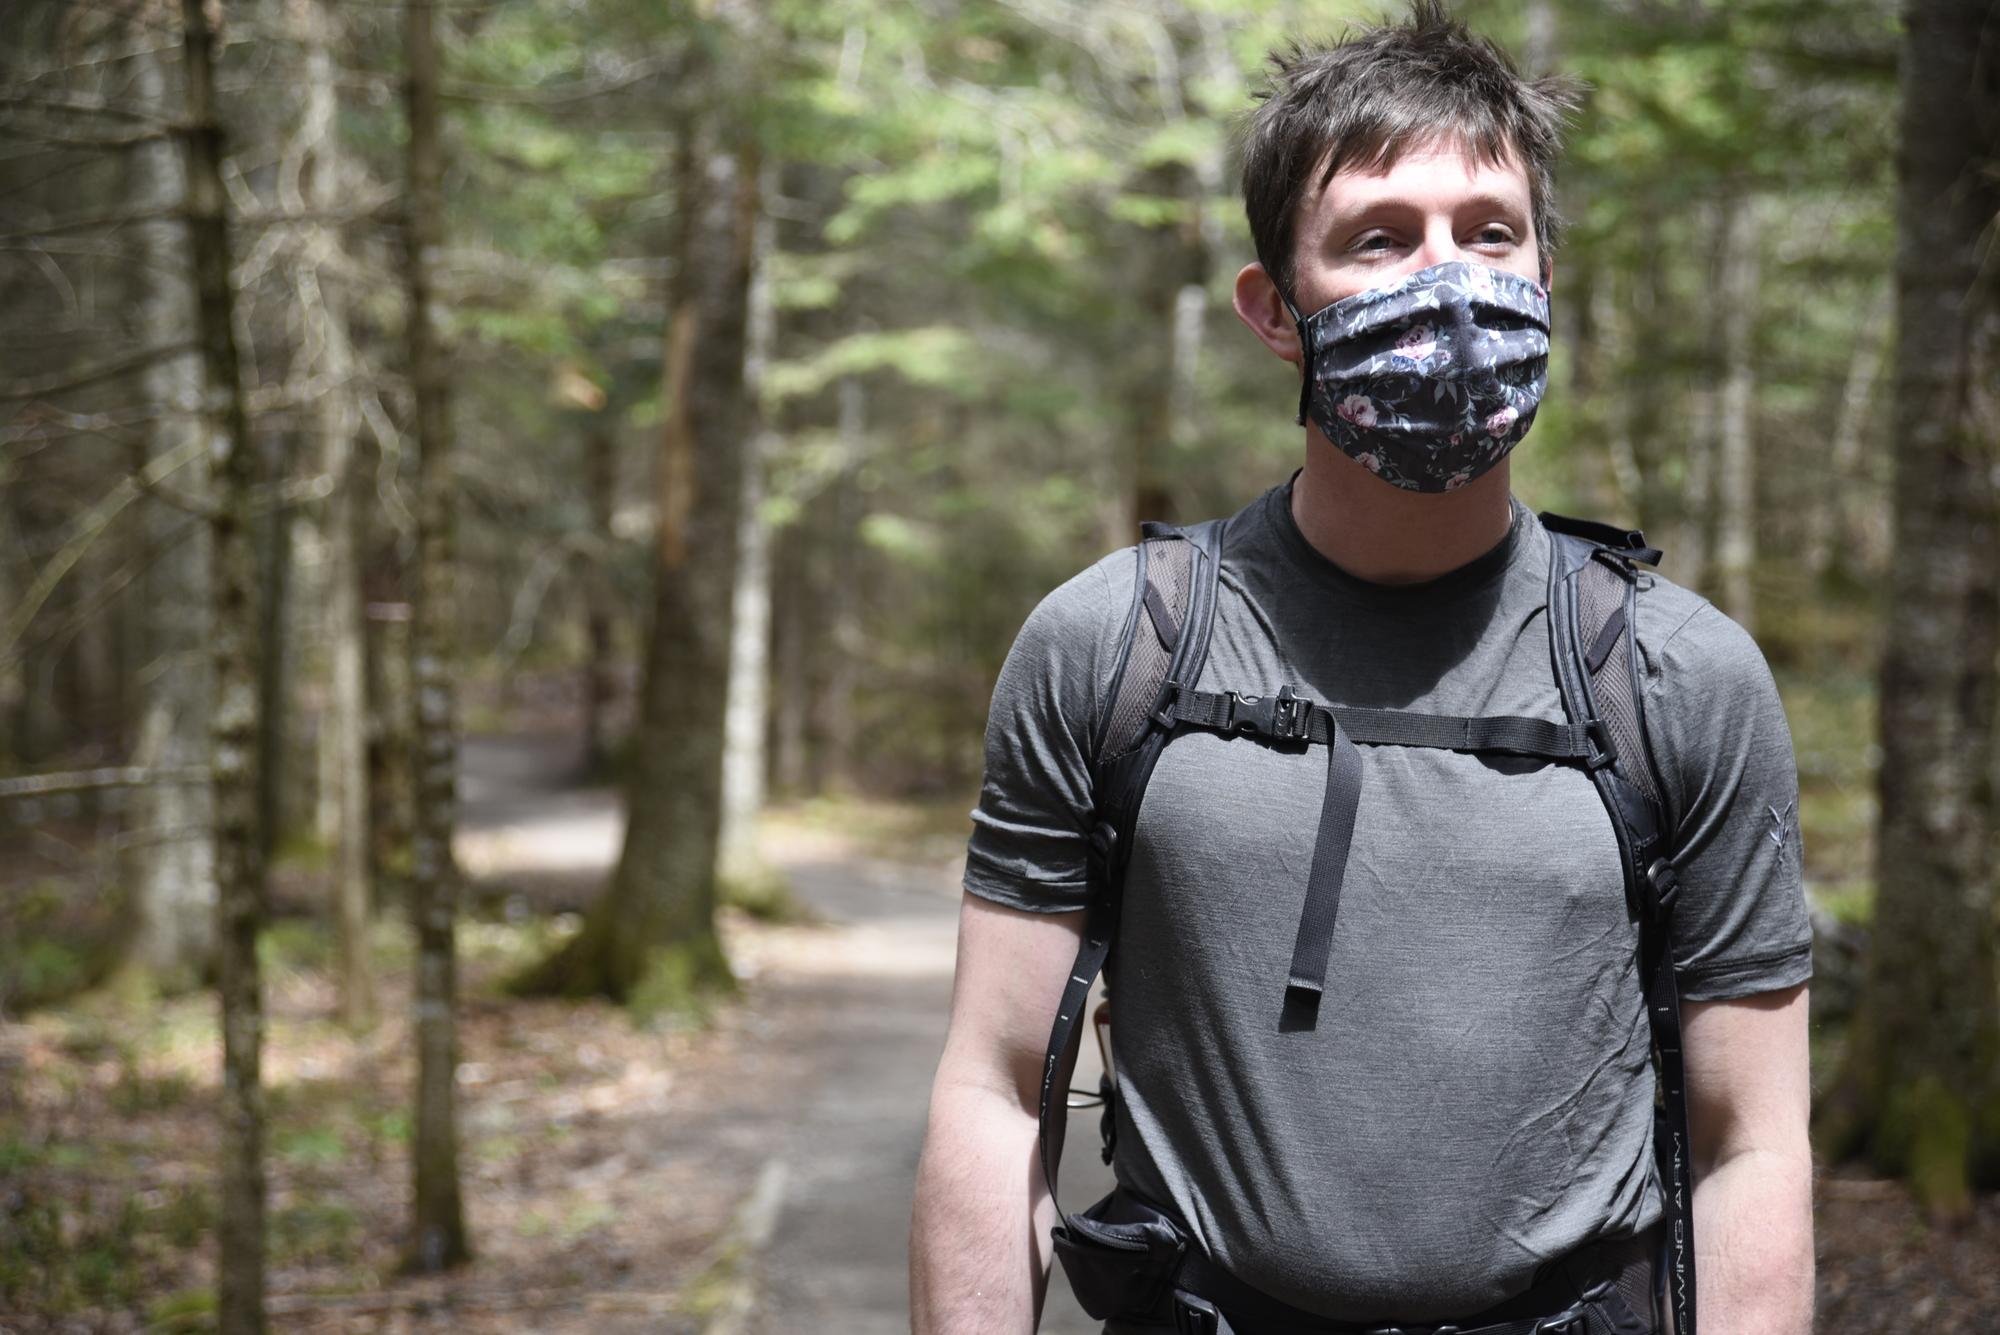 Hiker Wearing Mask